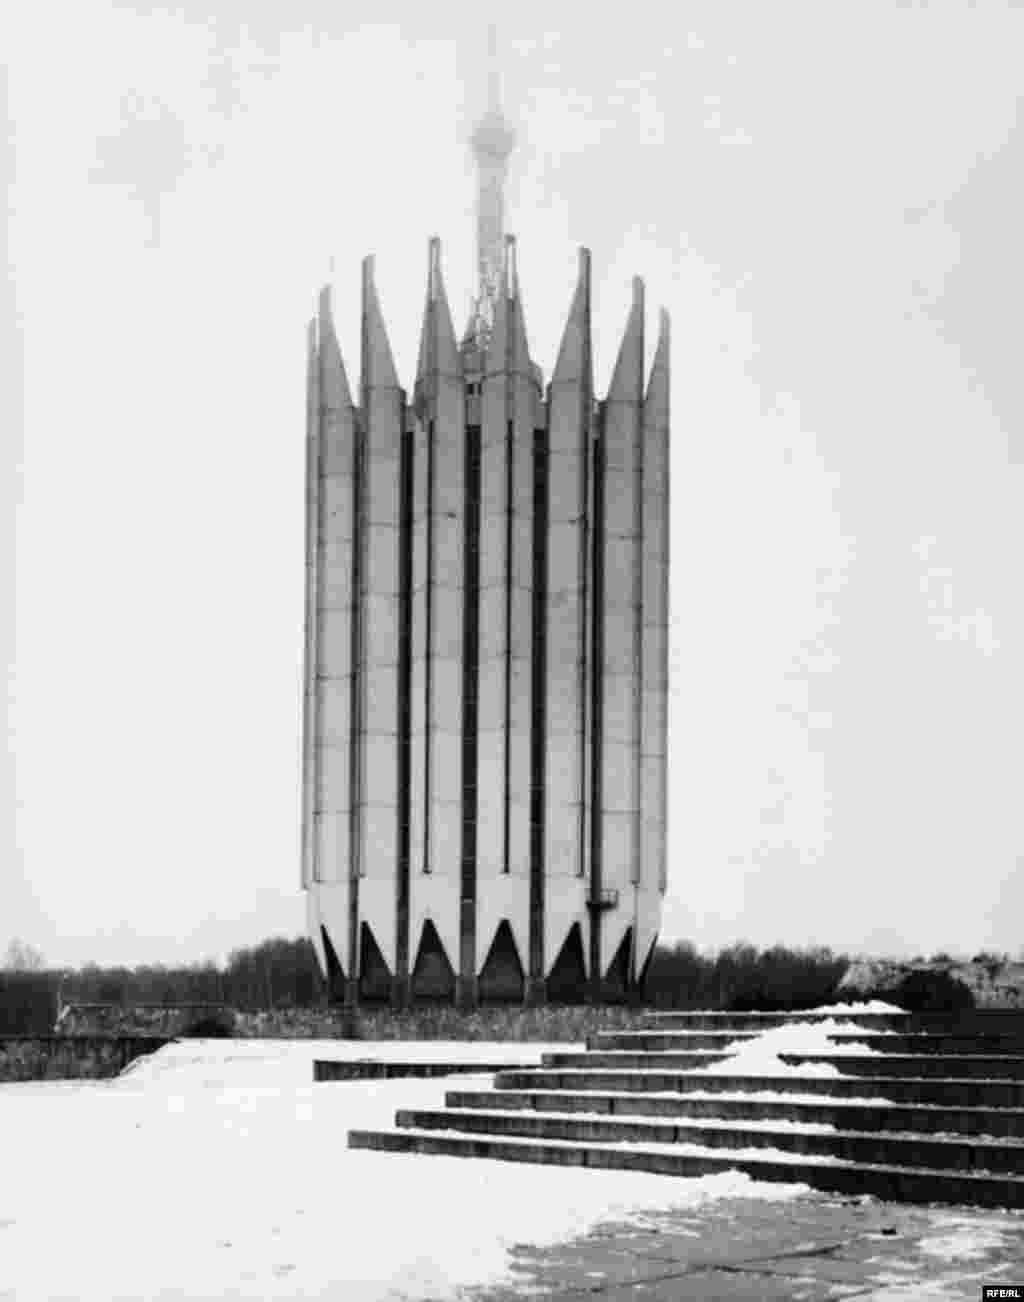 Cosmic Communist Constructions #4